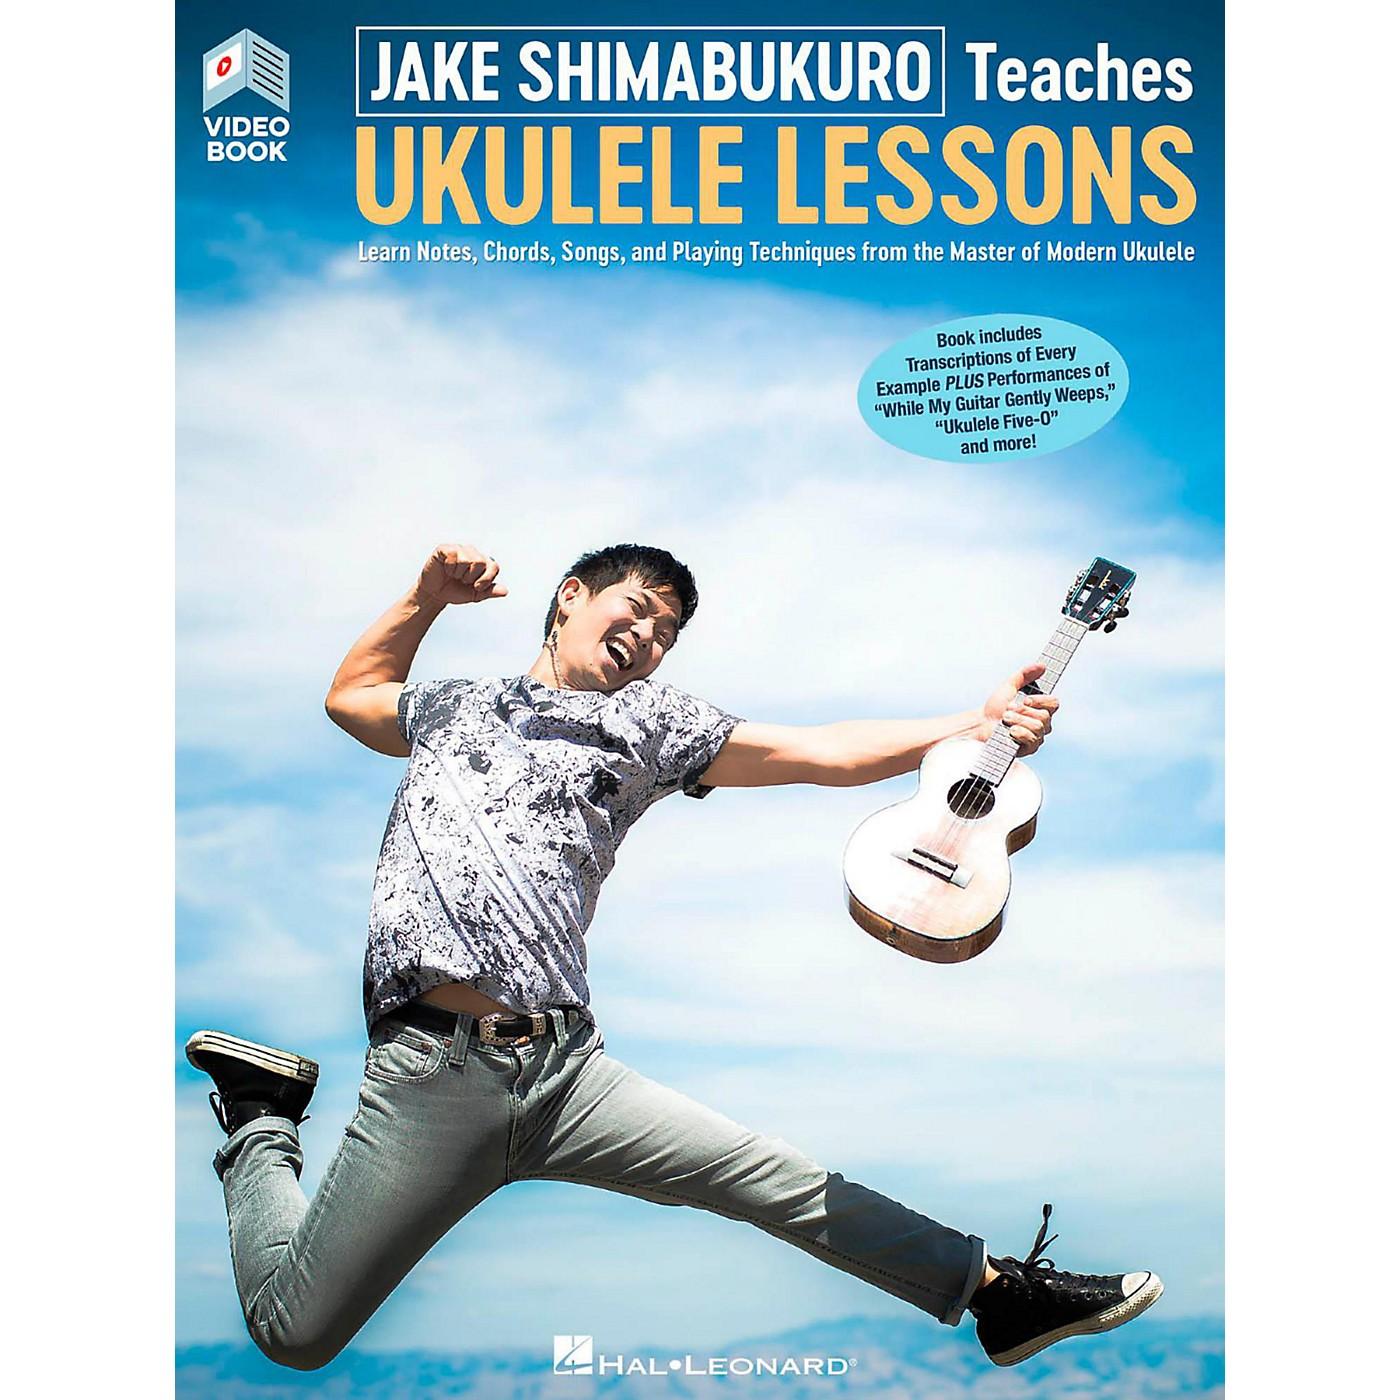 Hal Leonard Jake Shimabukuro Teaches Ukulele Lessons (Video/Book) thumbnail